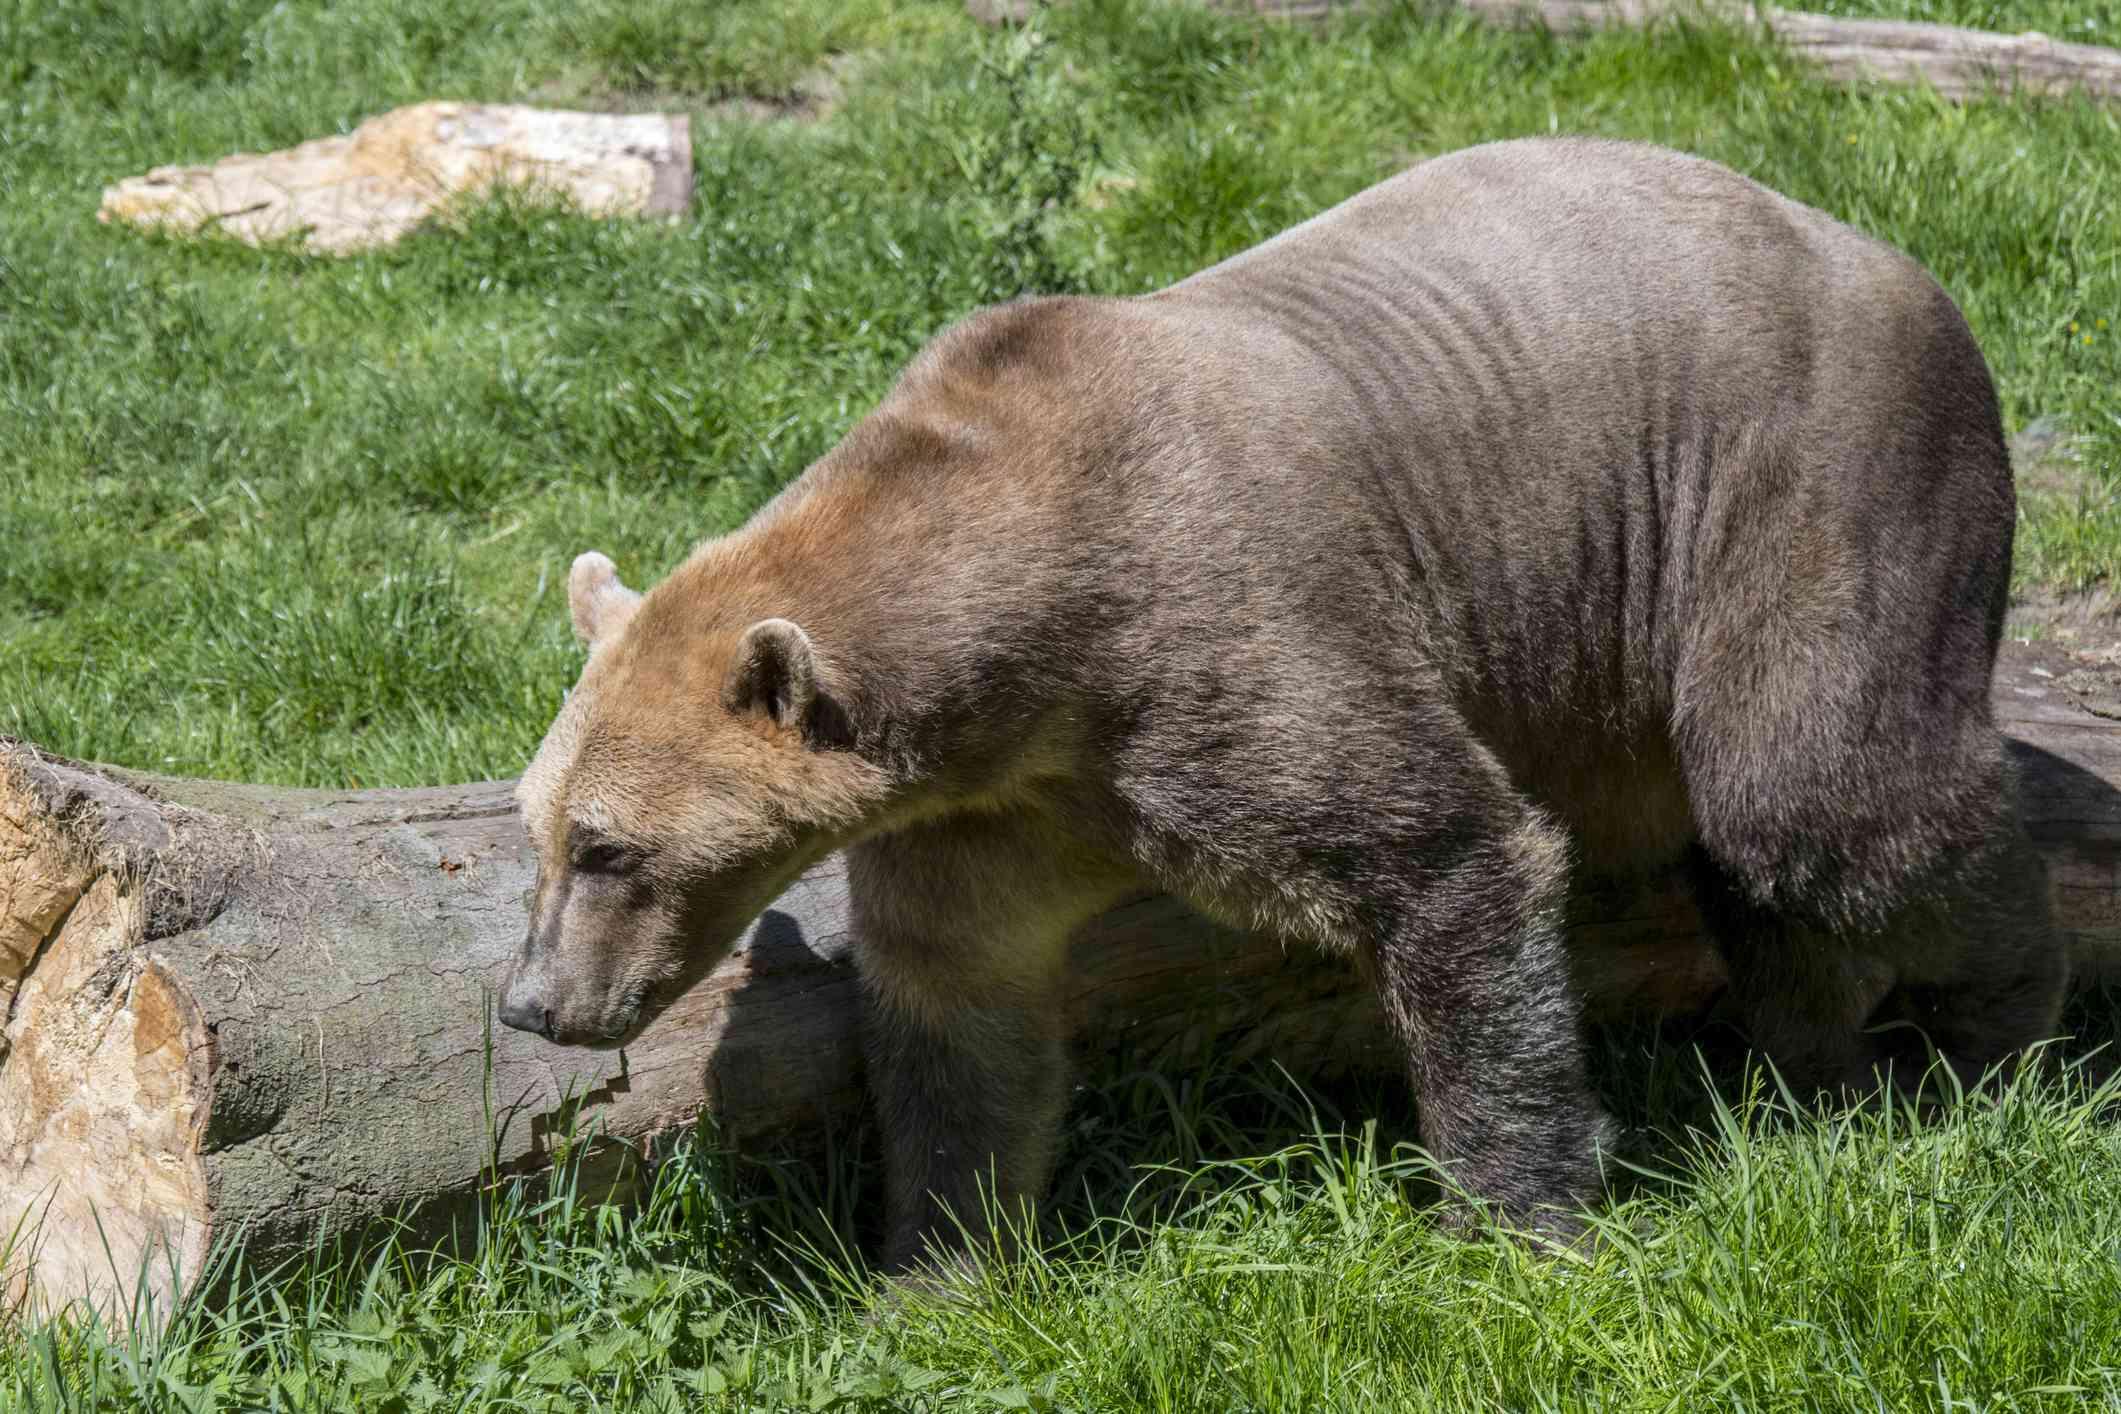 tan and white grolar bear hybrid walks in sun next to log